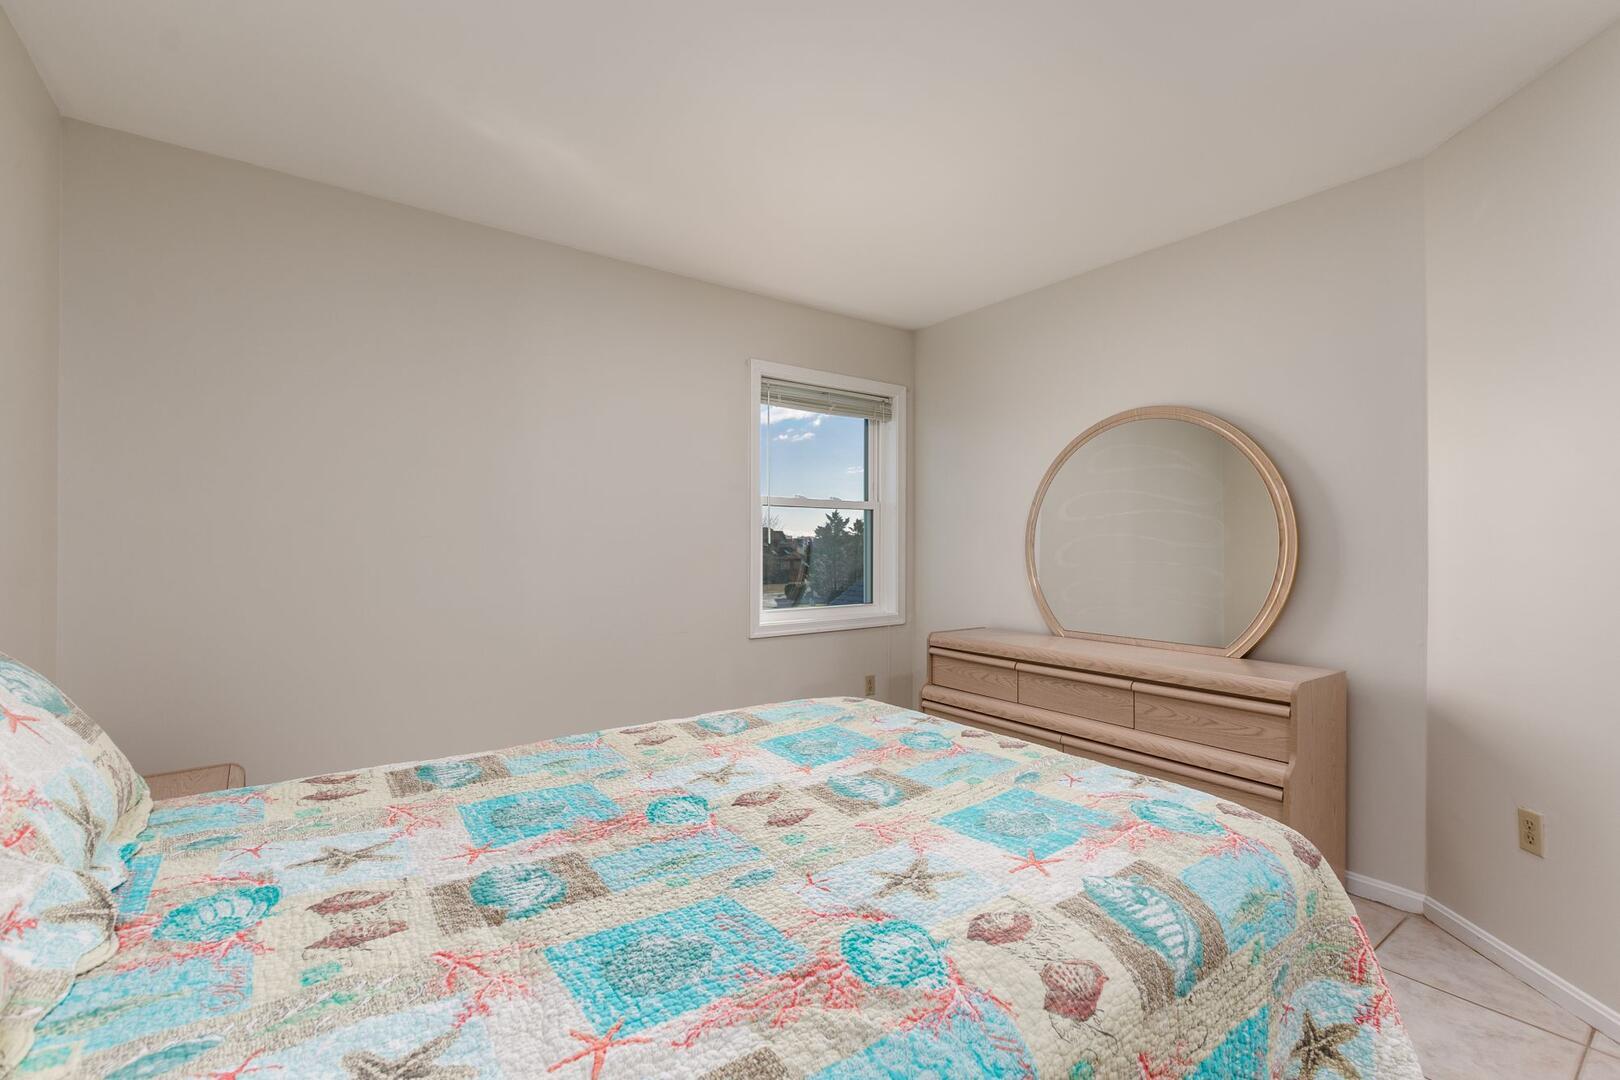 Bedroom 3 of Sunset Harbour 14127B